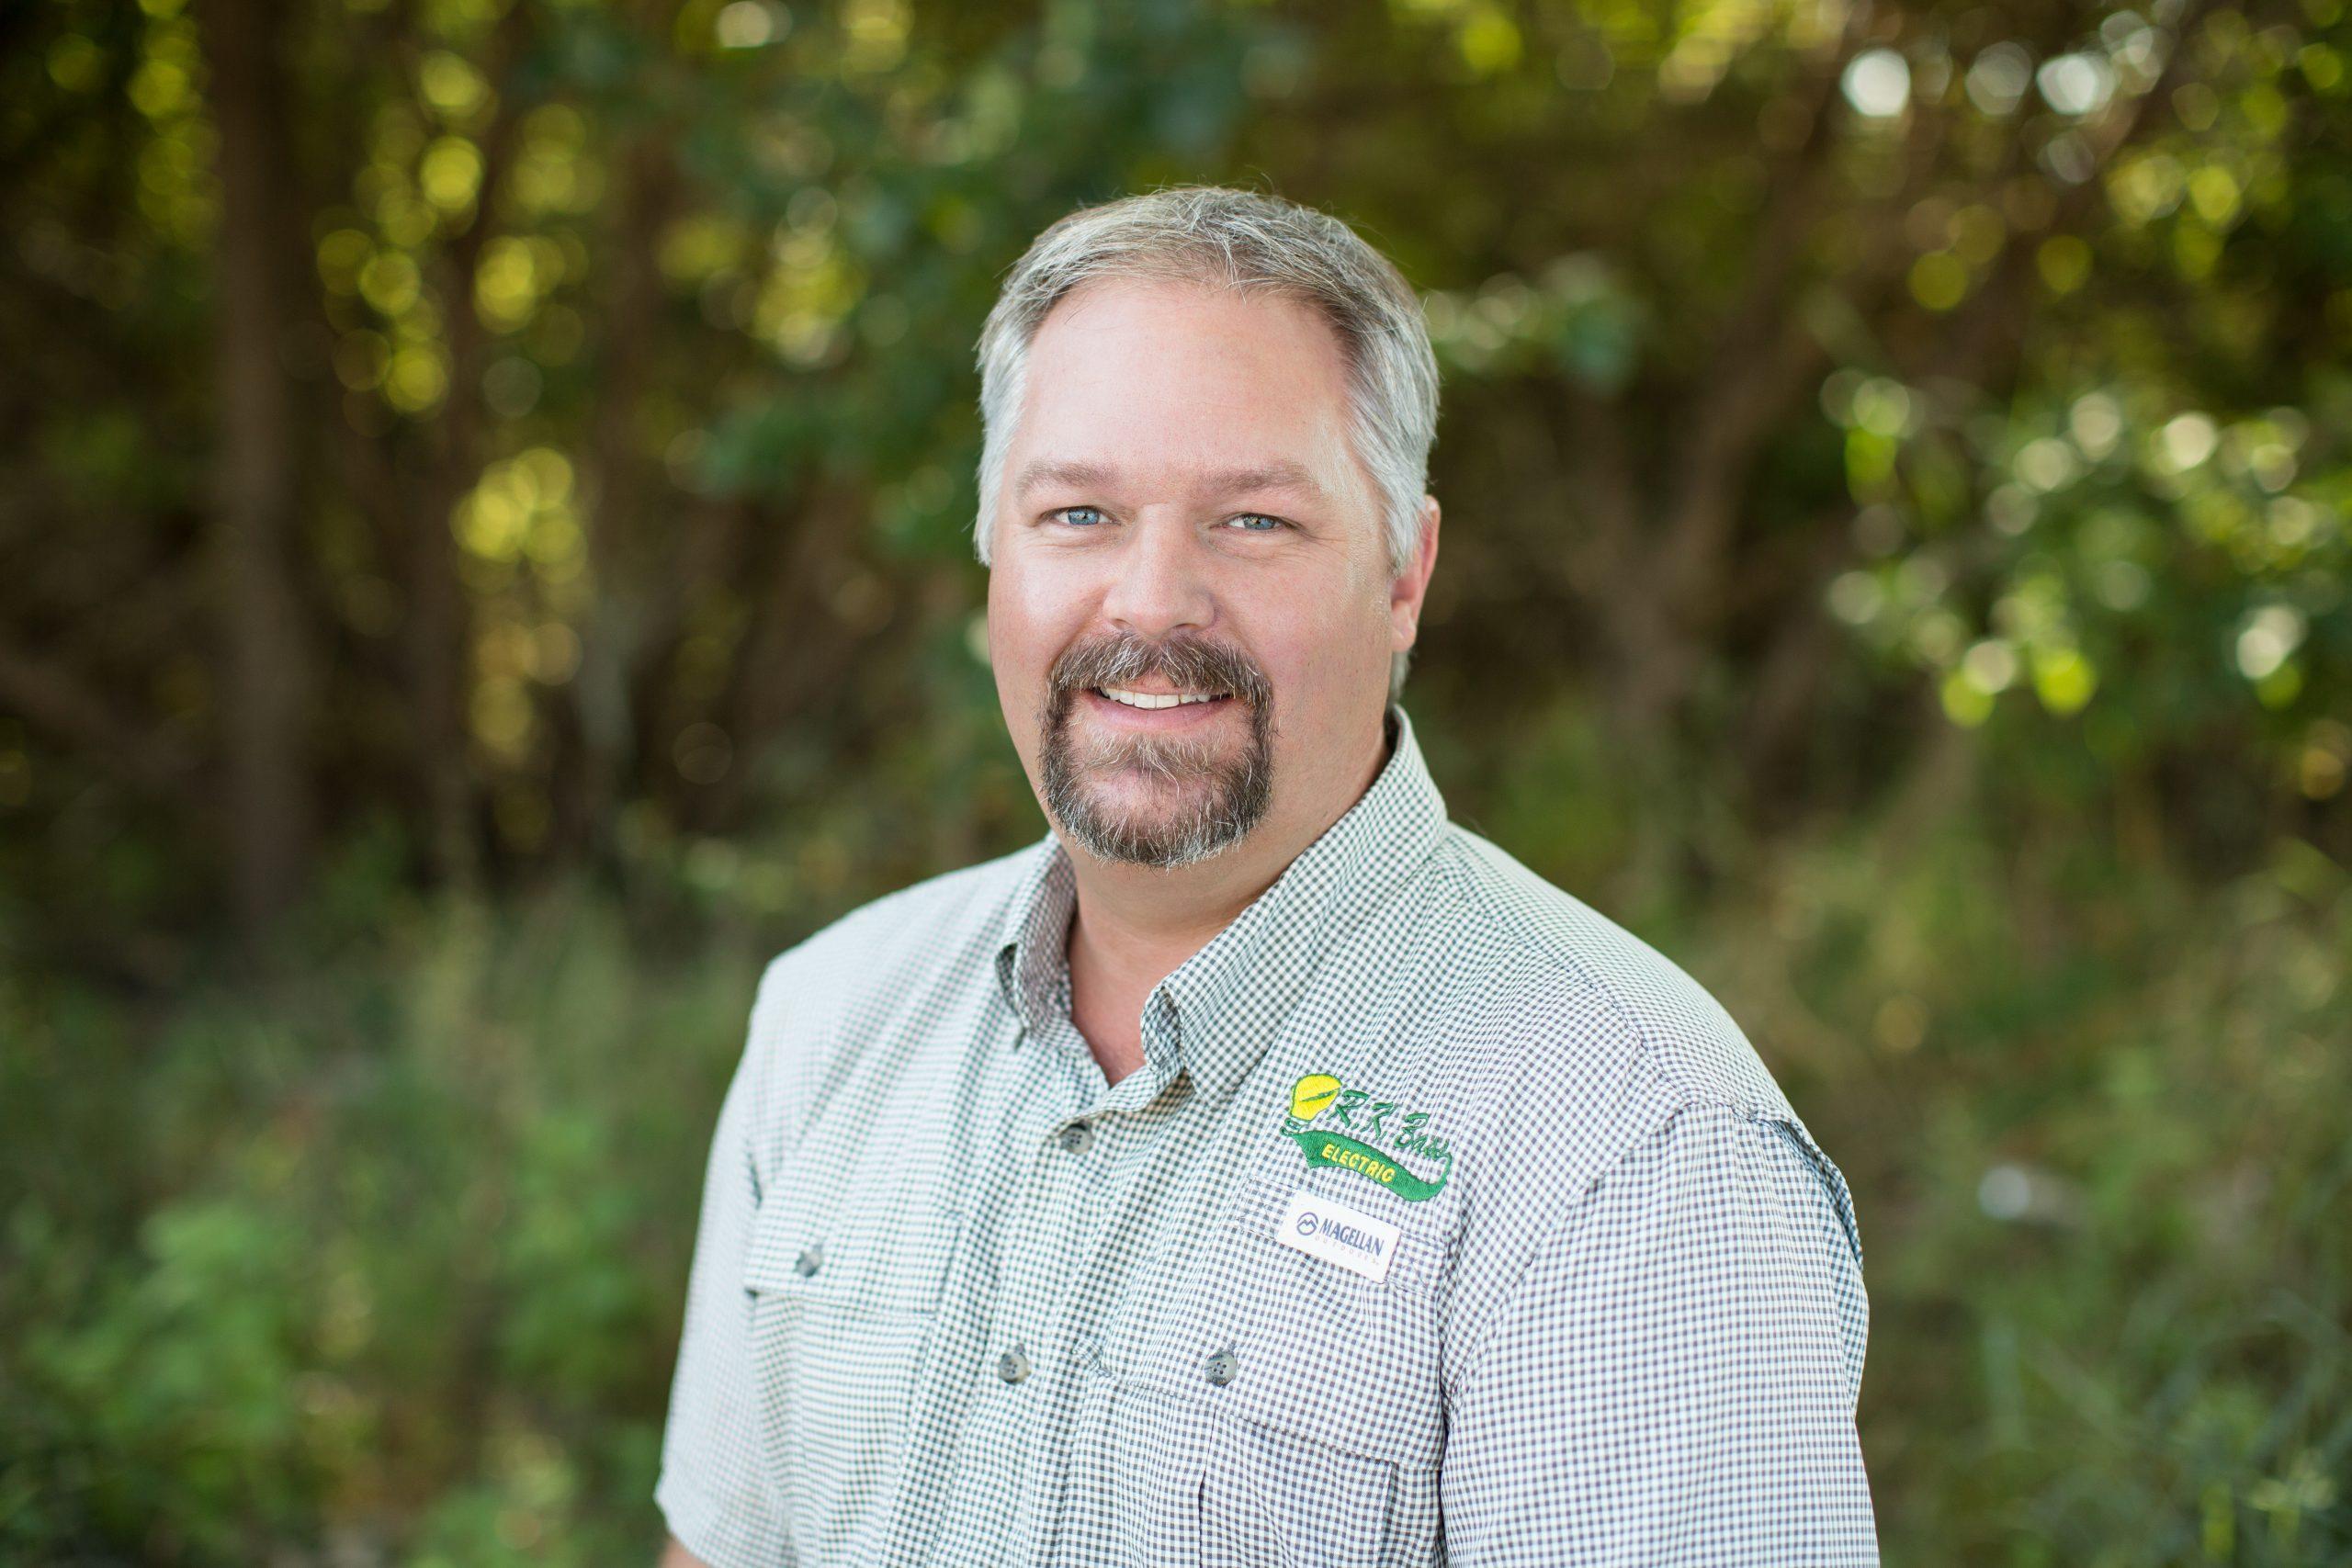 Corey Caskey | Design Construction Manager | R.K. Bass Electric, Inc.